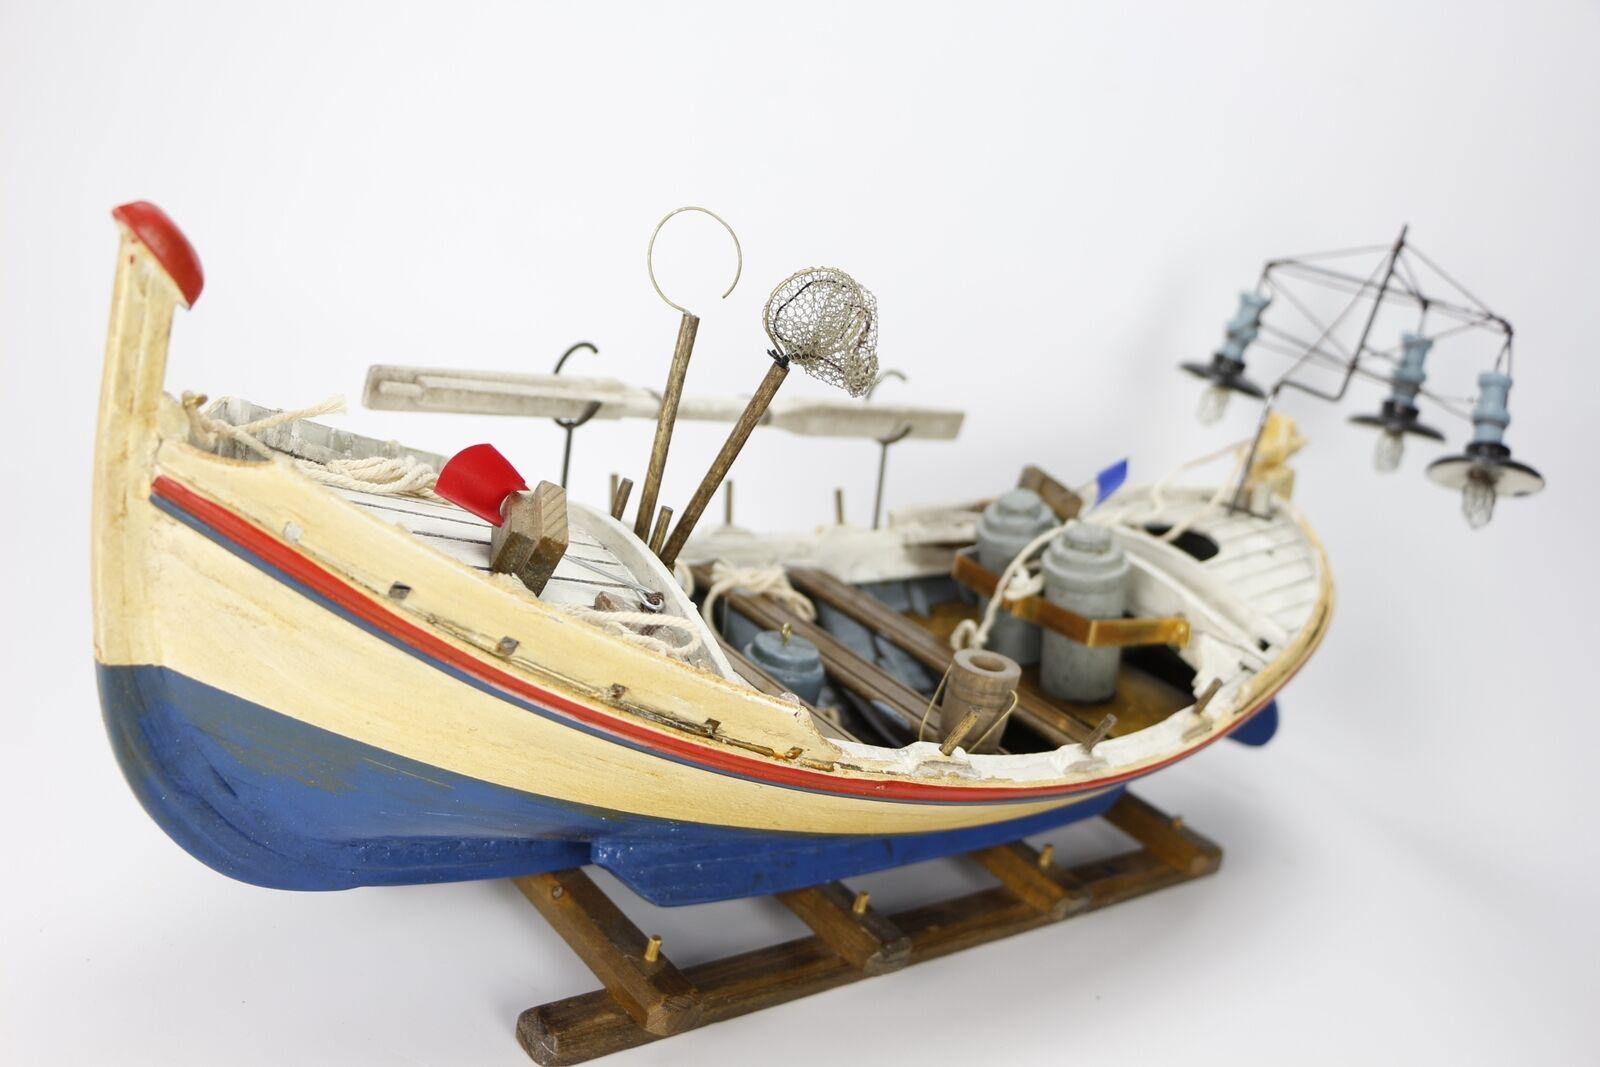 Barco Bote luces pesca  mediterráneo modelismo madera